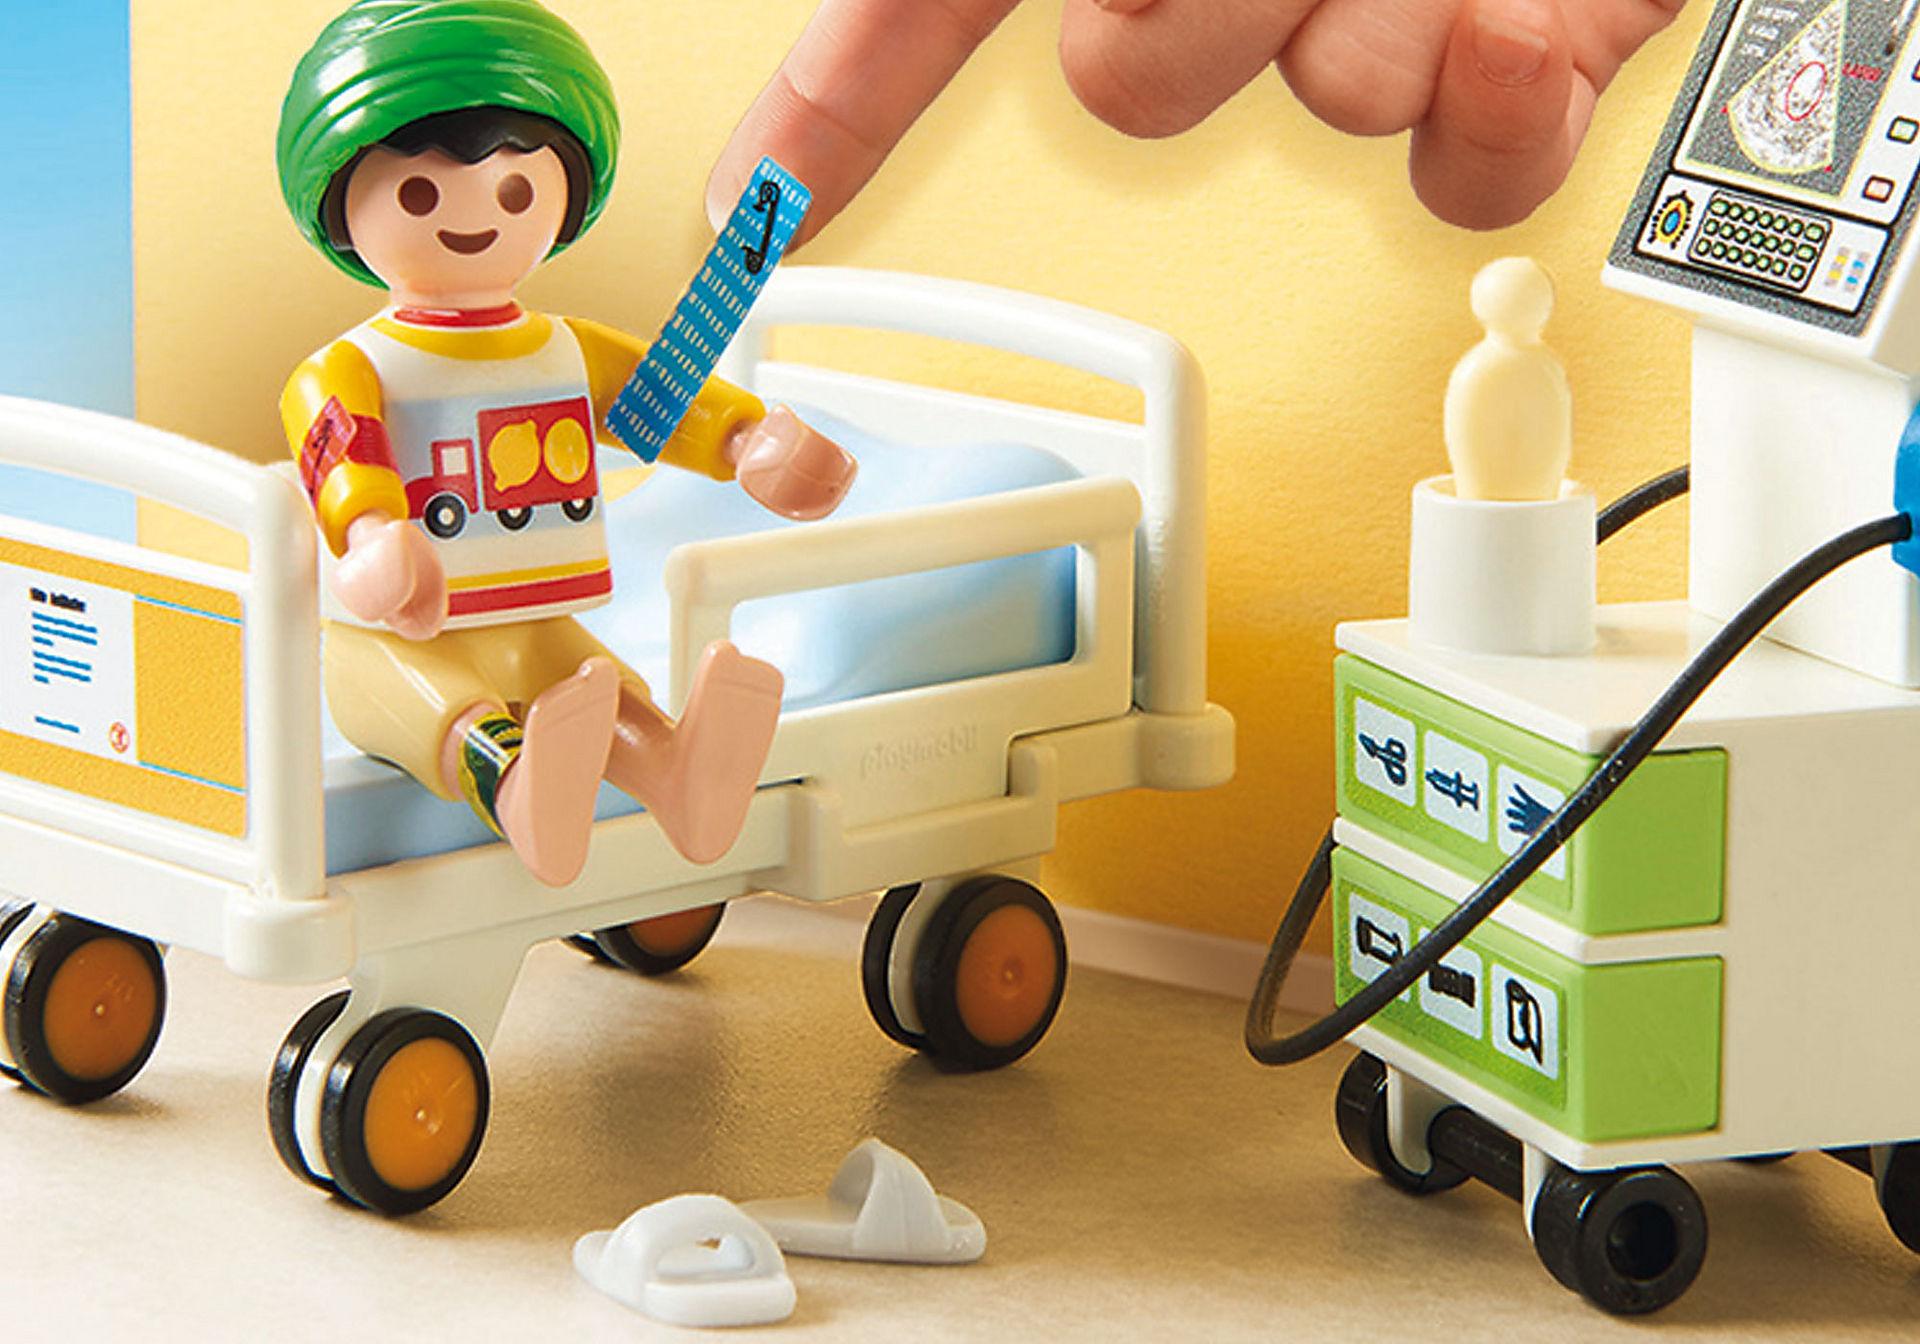 70192 Kinderziekenhuiskamer zoom image4